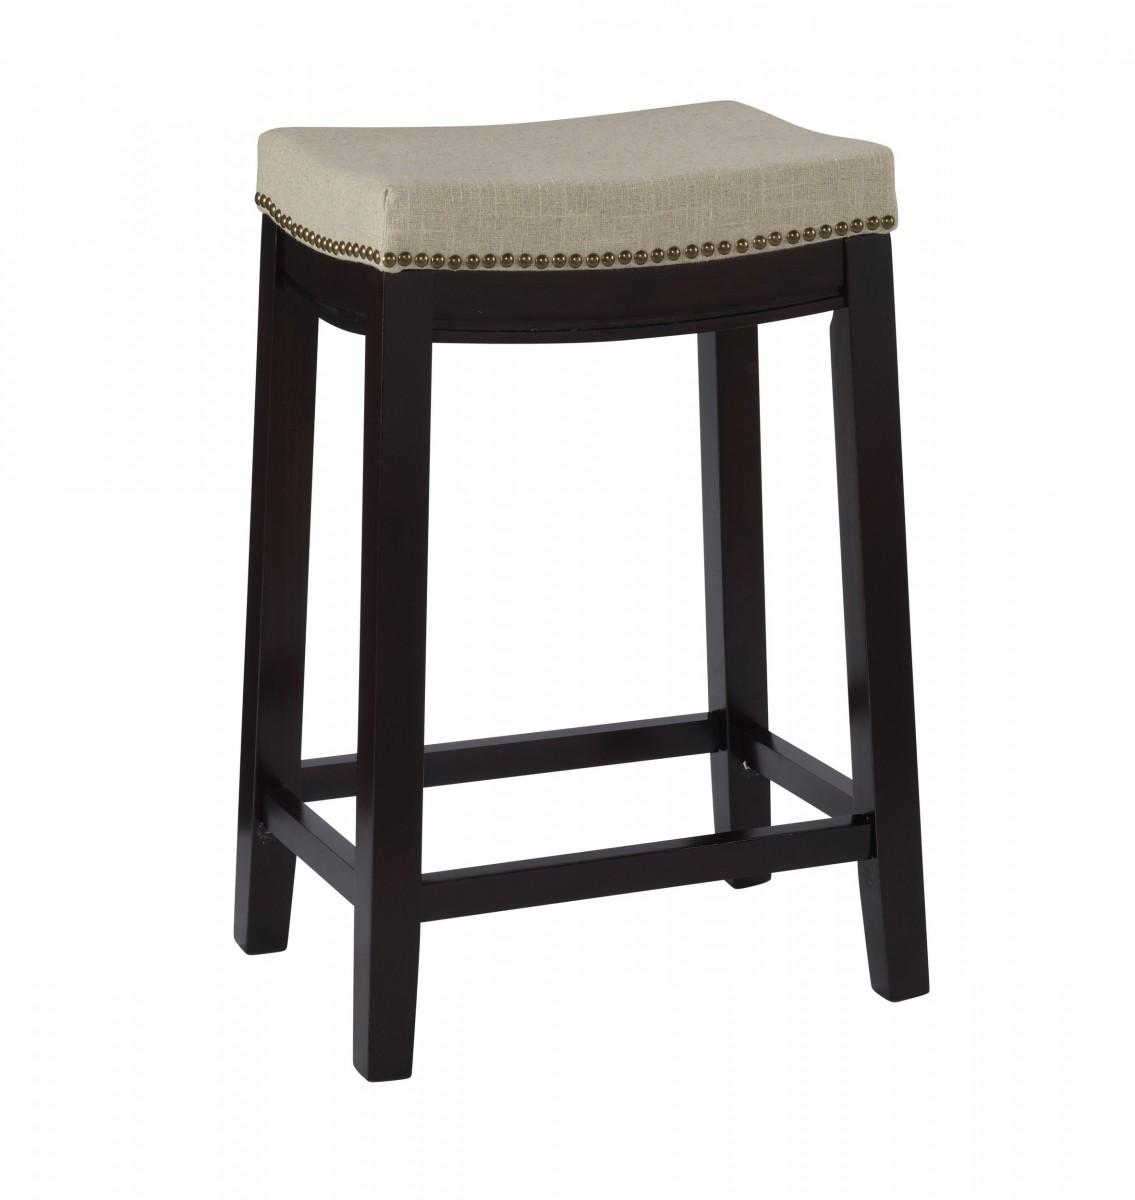 Linon Home Decor Products Inc Allure Beige Linen 24 Quot Stool In Dark Walnut Finish